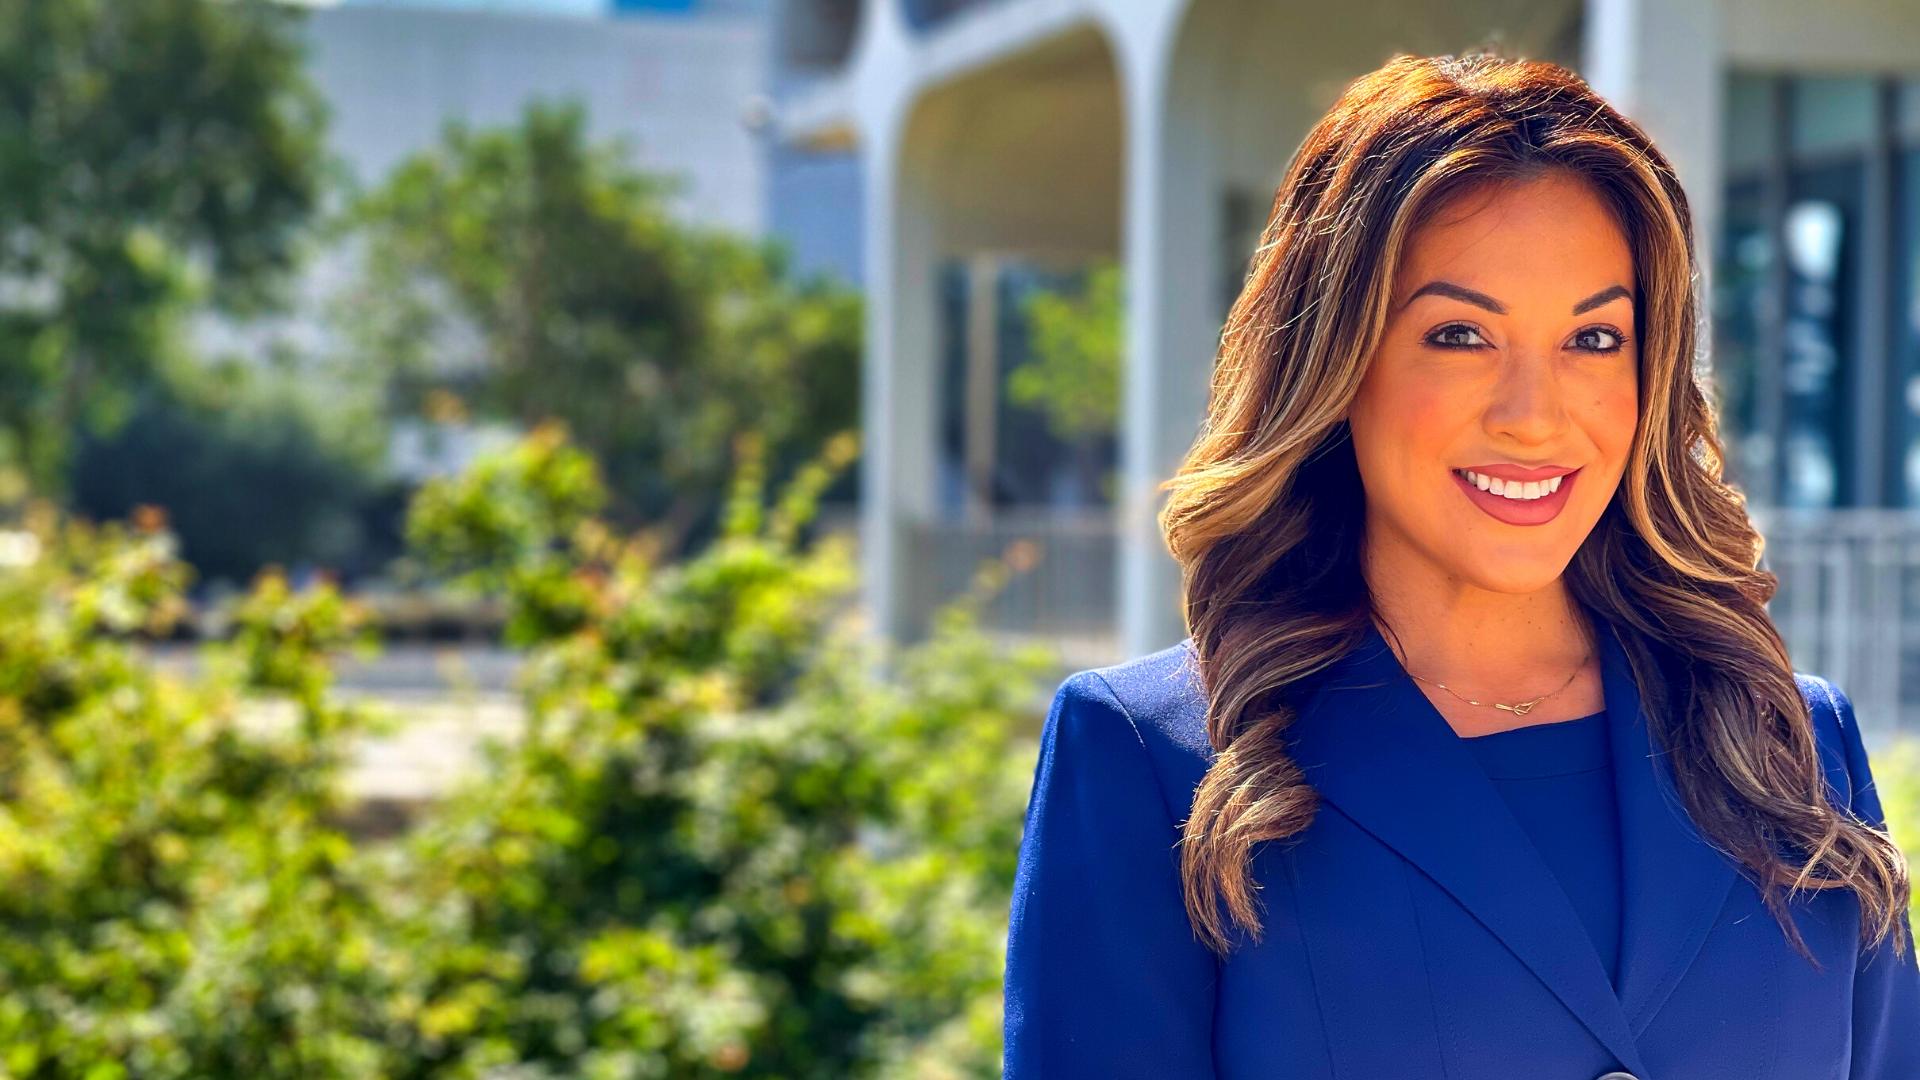 Deputy District Attorney Adrienne Mendoza